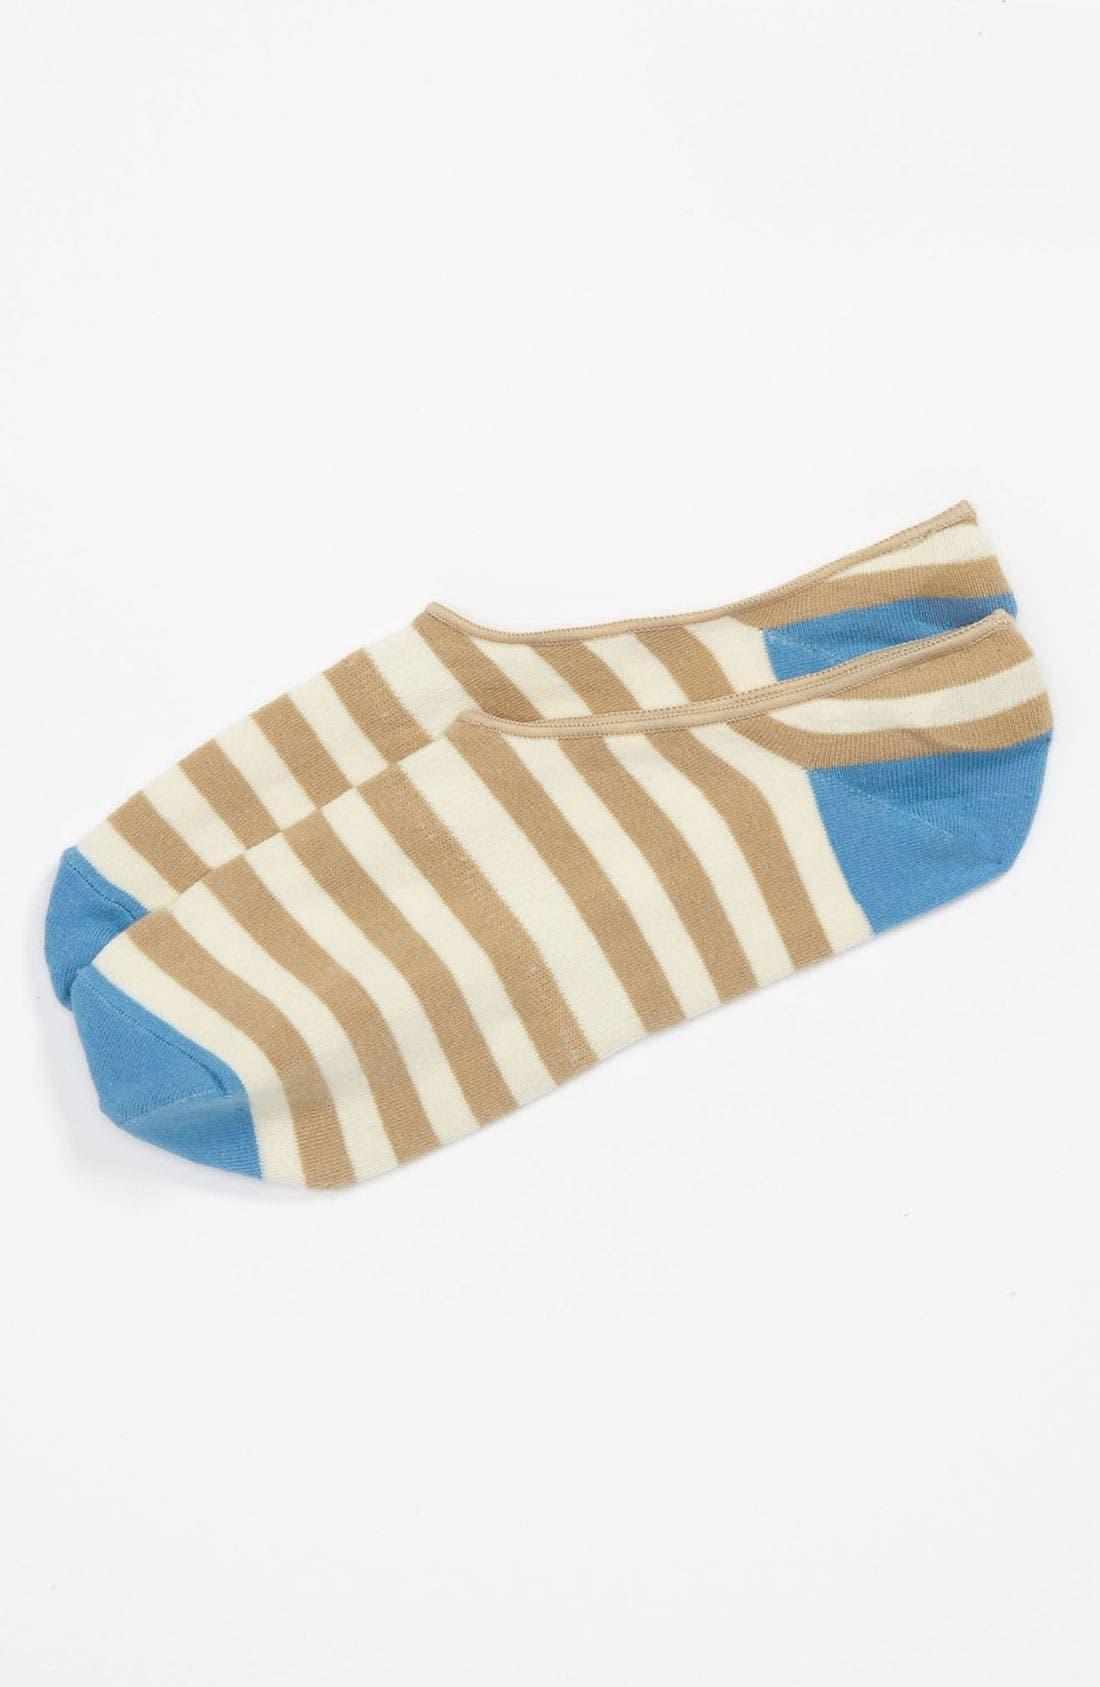 Alternate Image 1 Selected - Lorenzo Uomo No-Show Socks (Men)